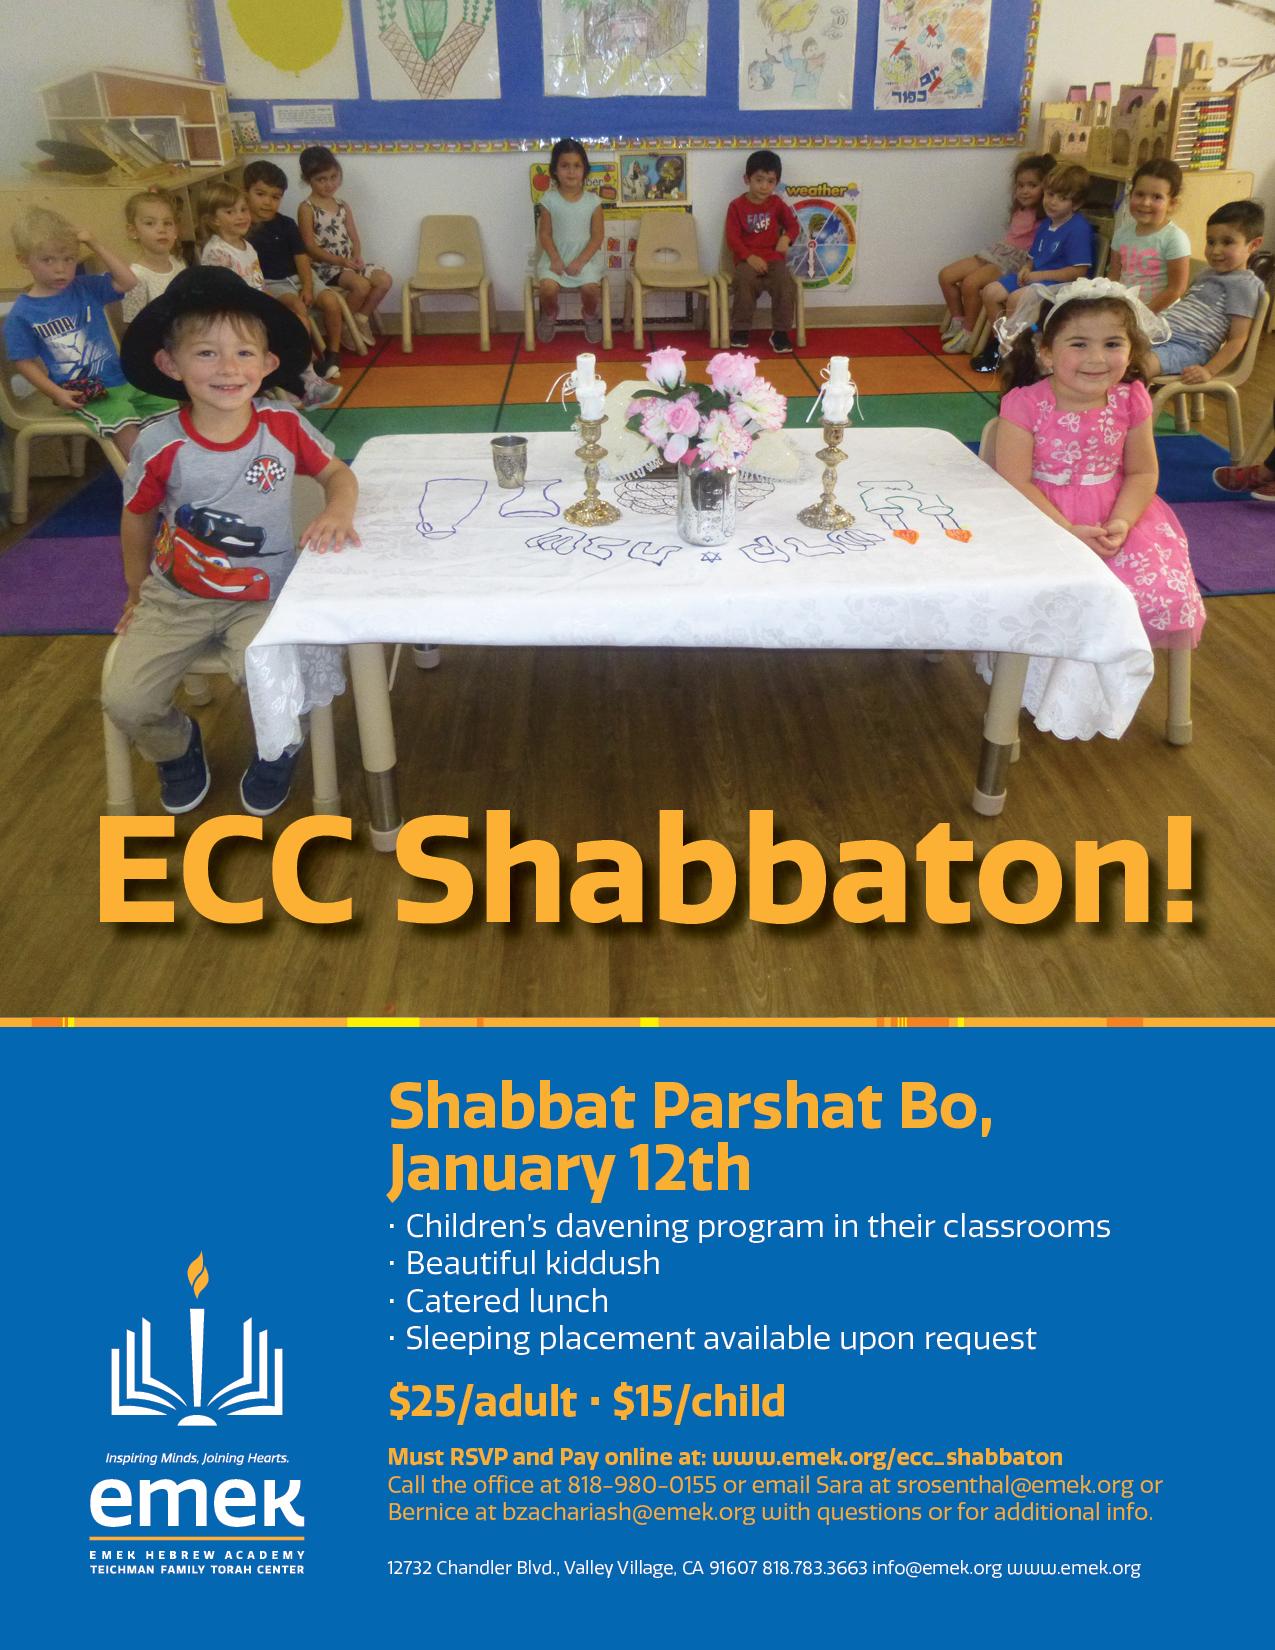 ECC_Shabbaton2018_Flyr_FNL.jpg